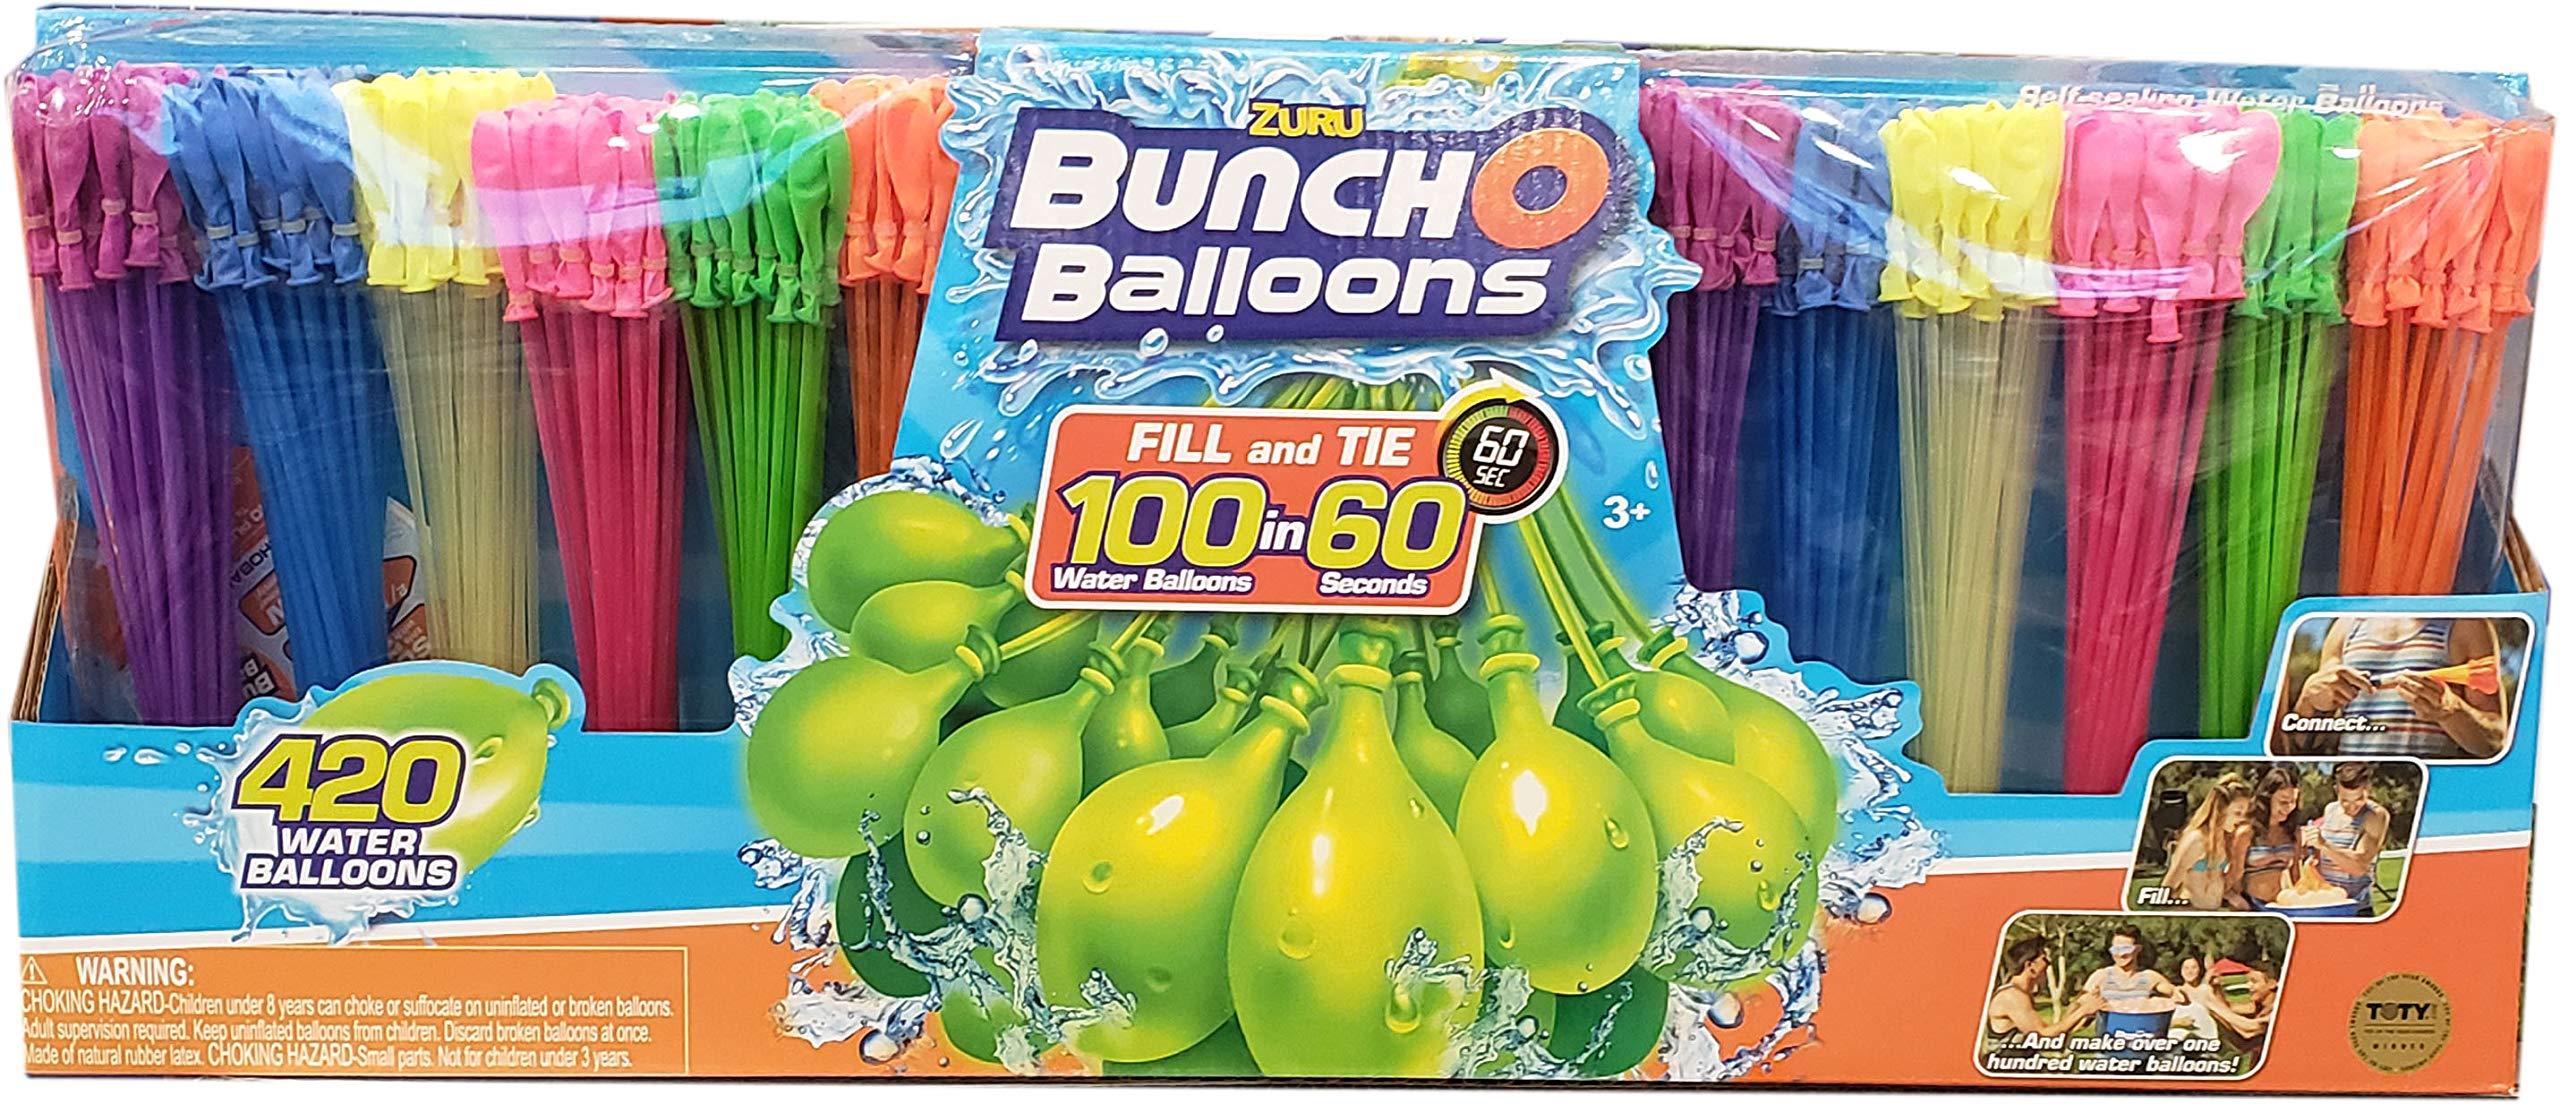 Bunch O Balloons Zuru 420 Instant Self Sealing Water Balloons, Brown/a by Bunch O Balloons (Image #1)